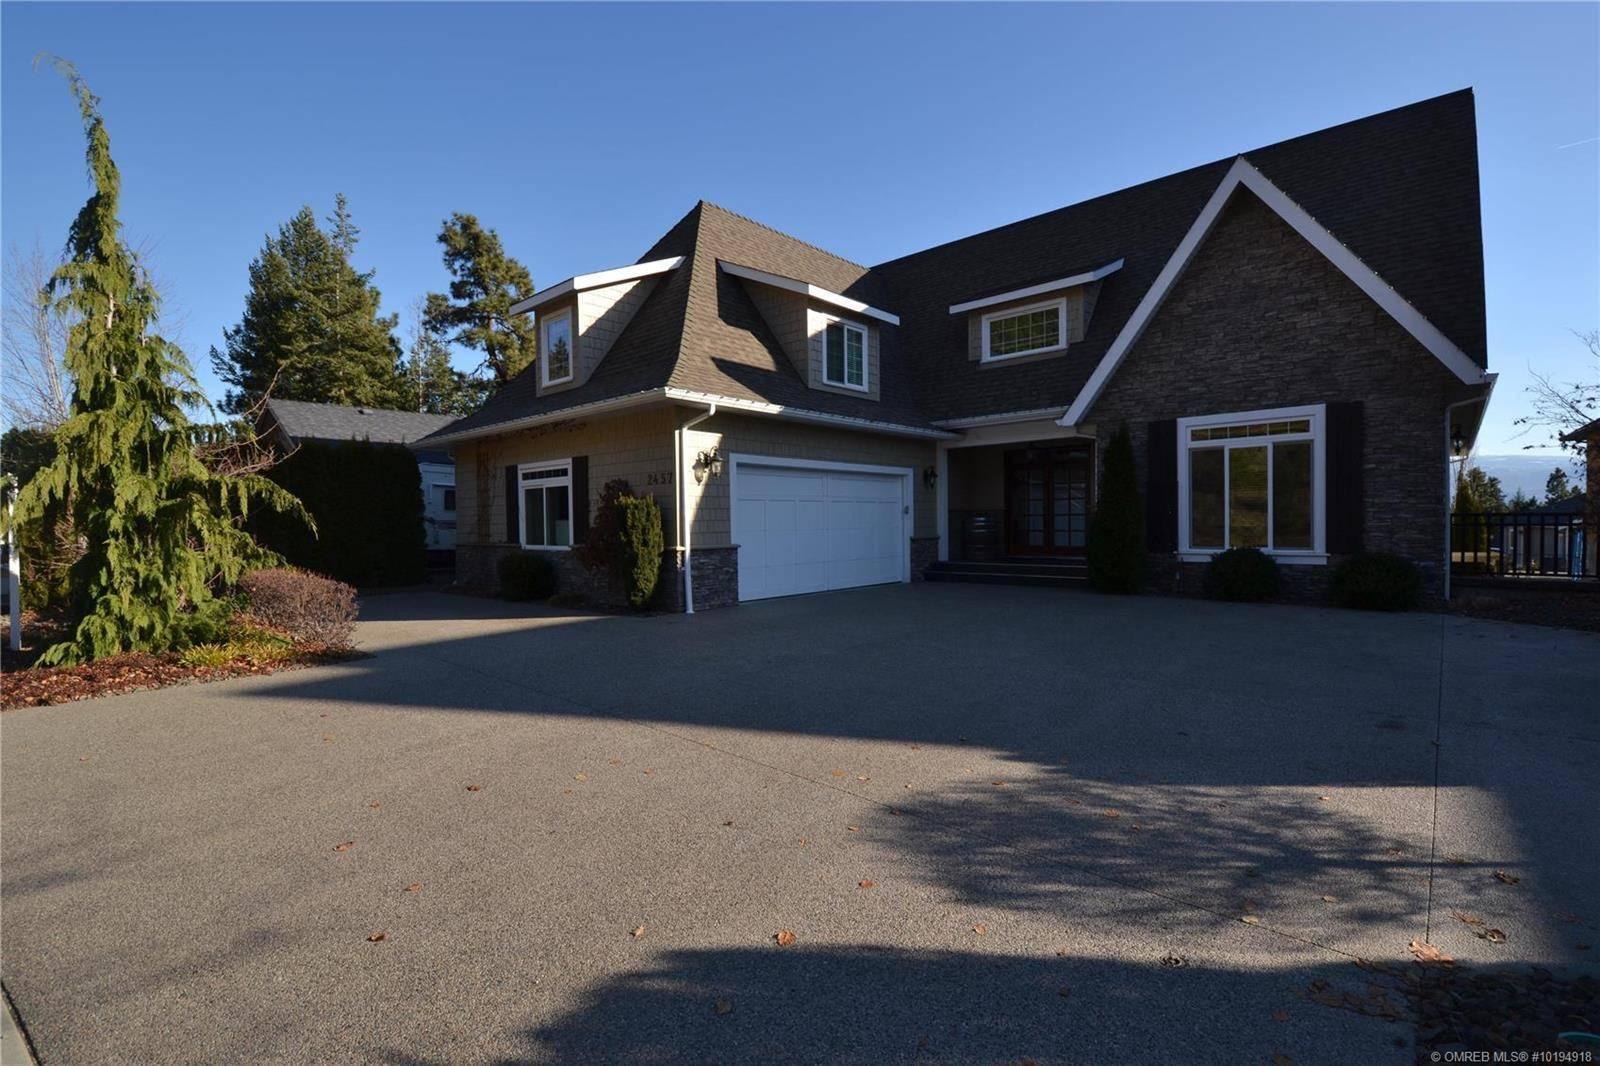 House for sale at 2457 Tallus Ridge Dr West Kelowna British Columbia - MLS: 10194918